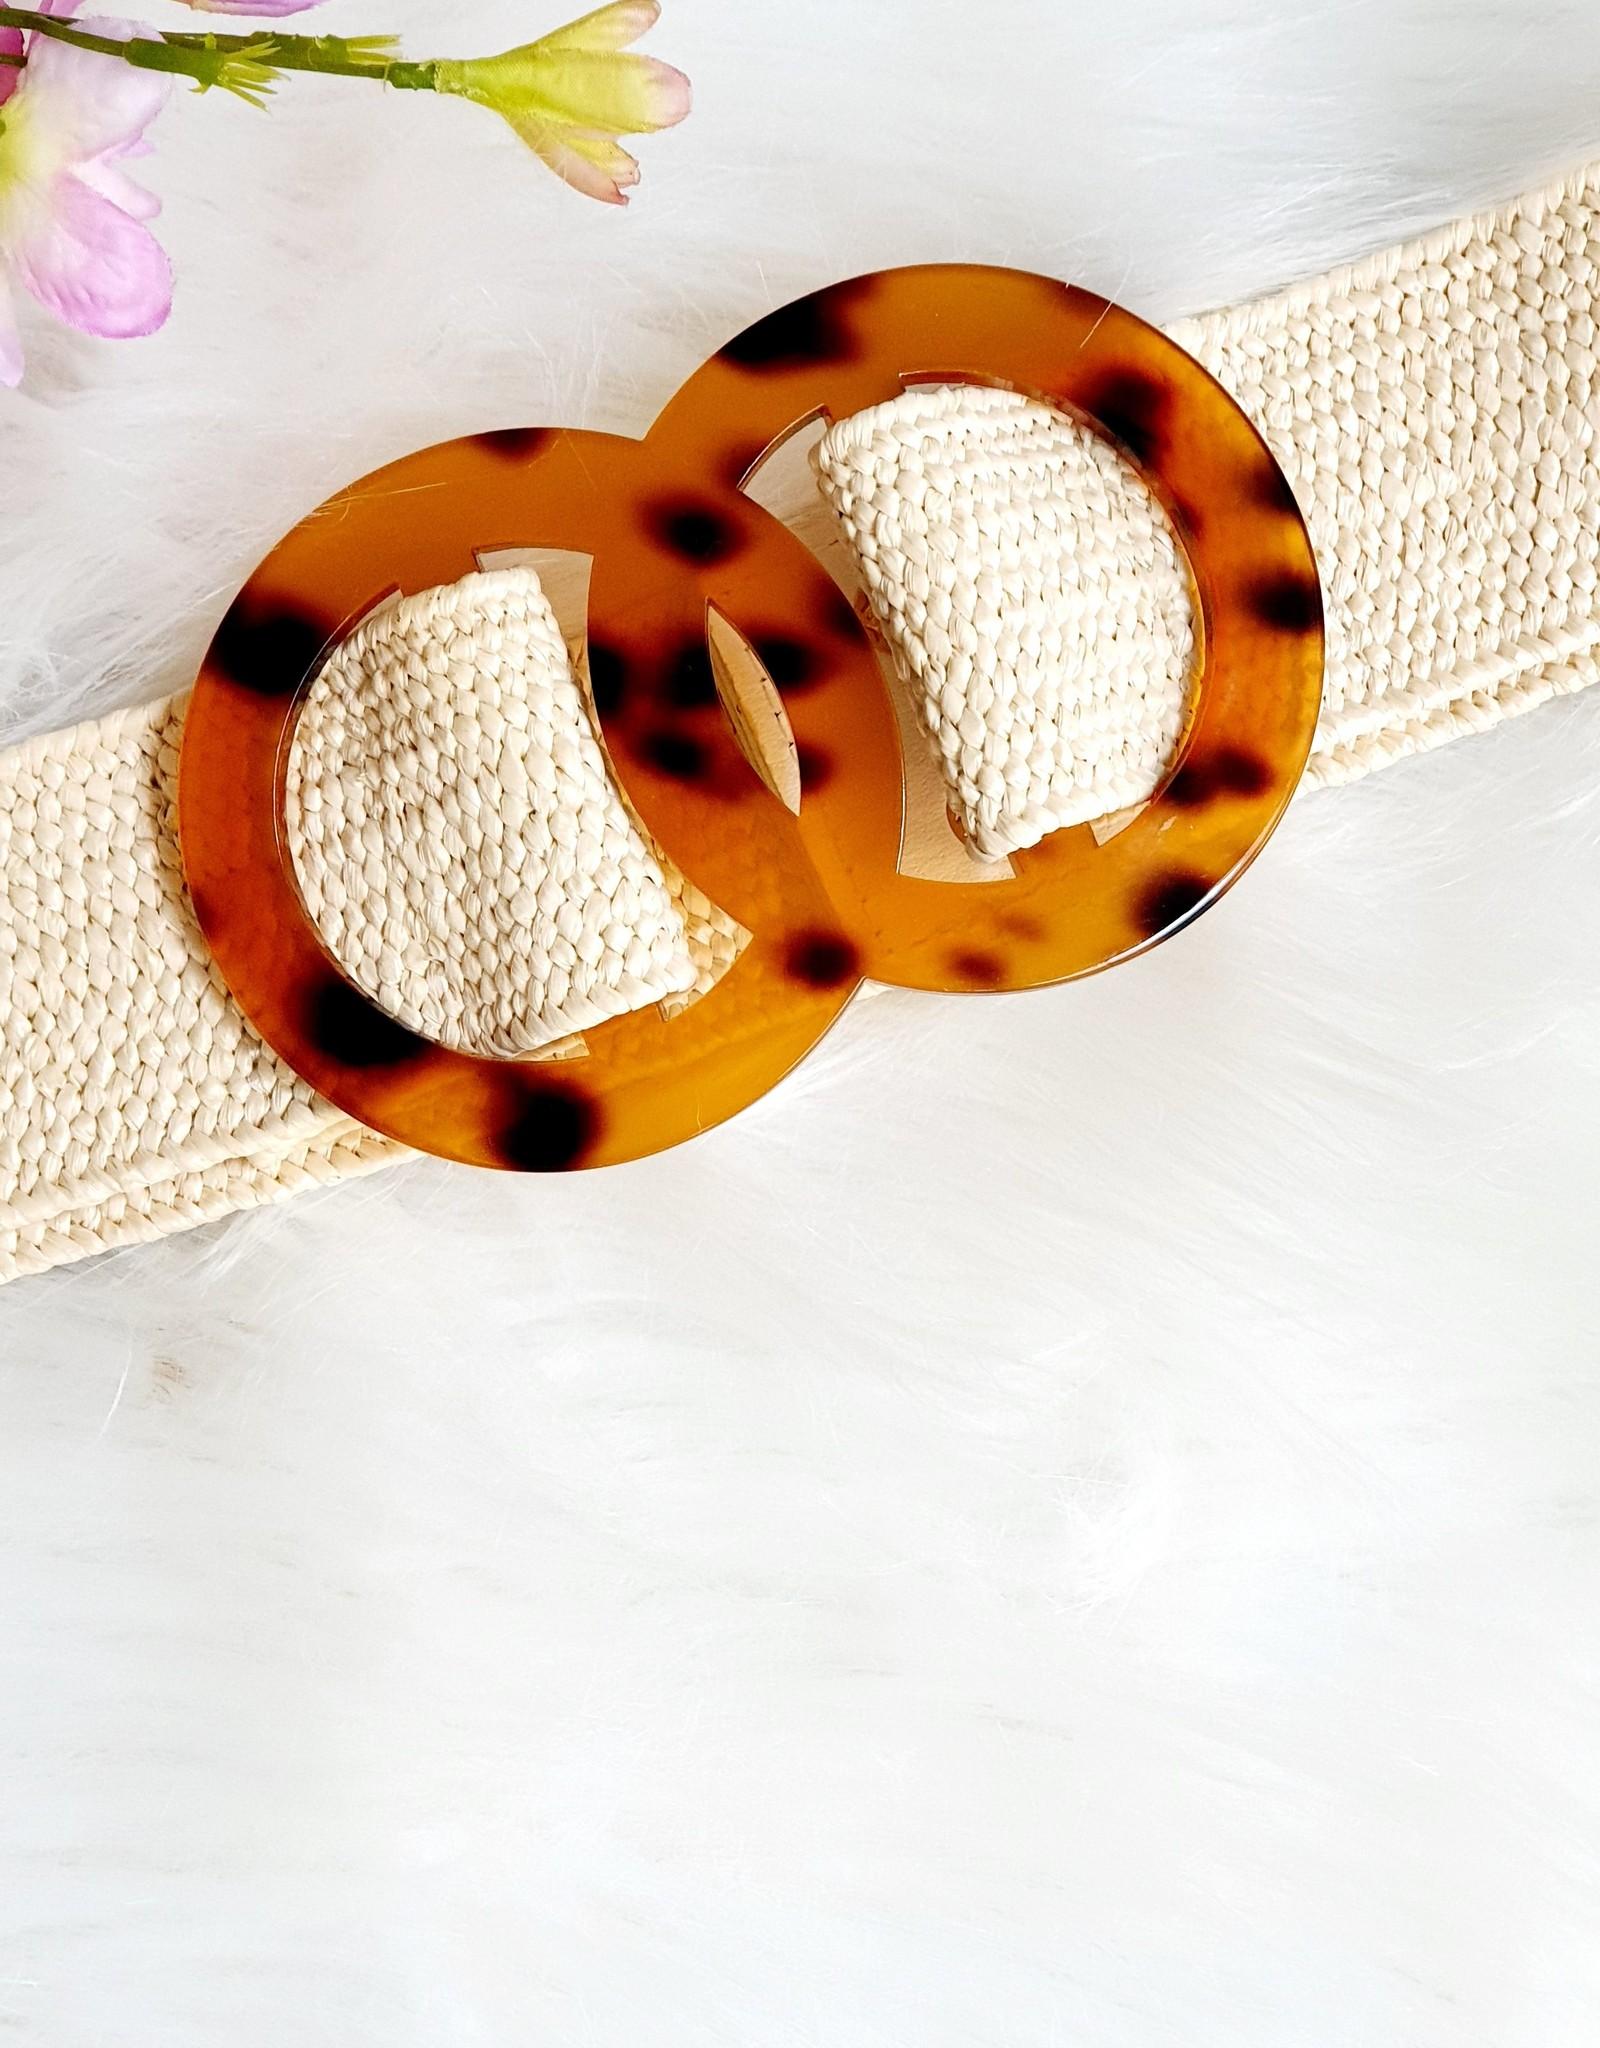 Thé light sanded belt